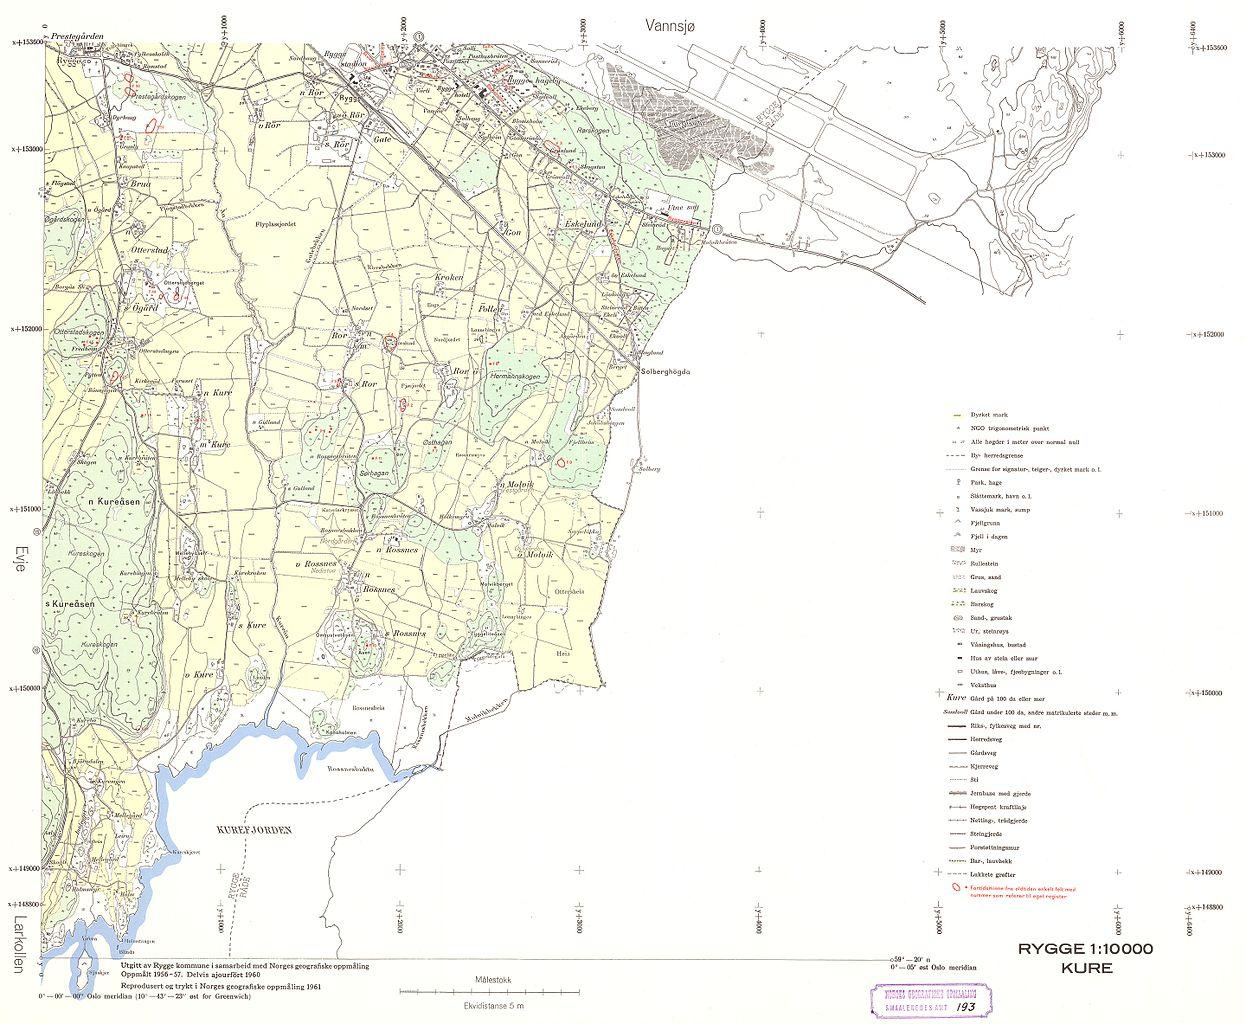 oslo rygge kart File:Smålenenes amt nr 193 3  Kart over Rygge; Kure, 1961.  oslo rygge kart